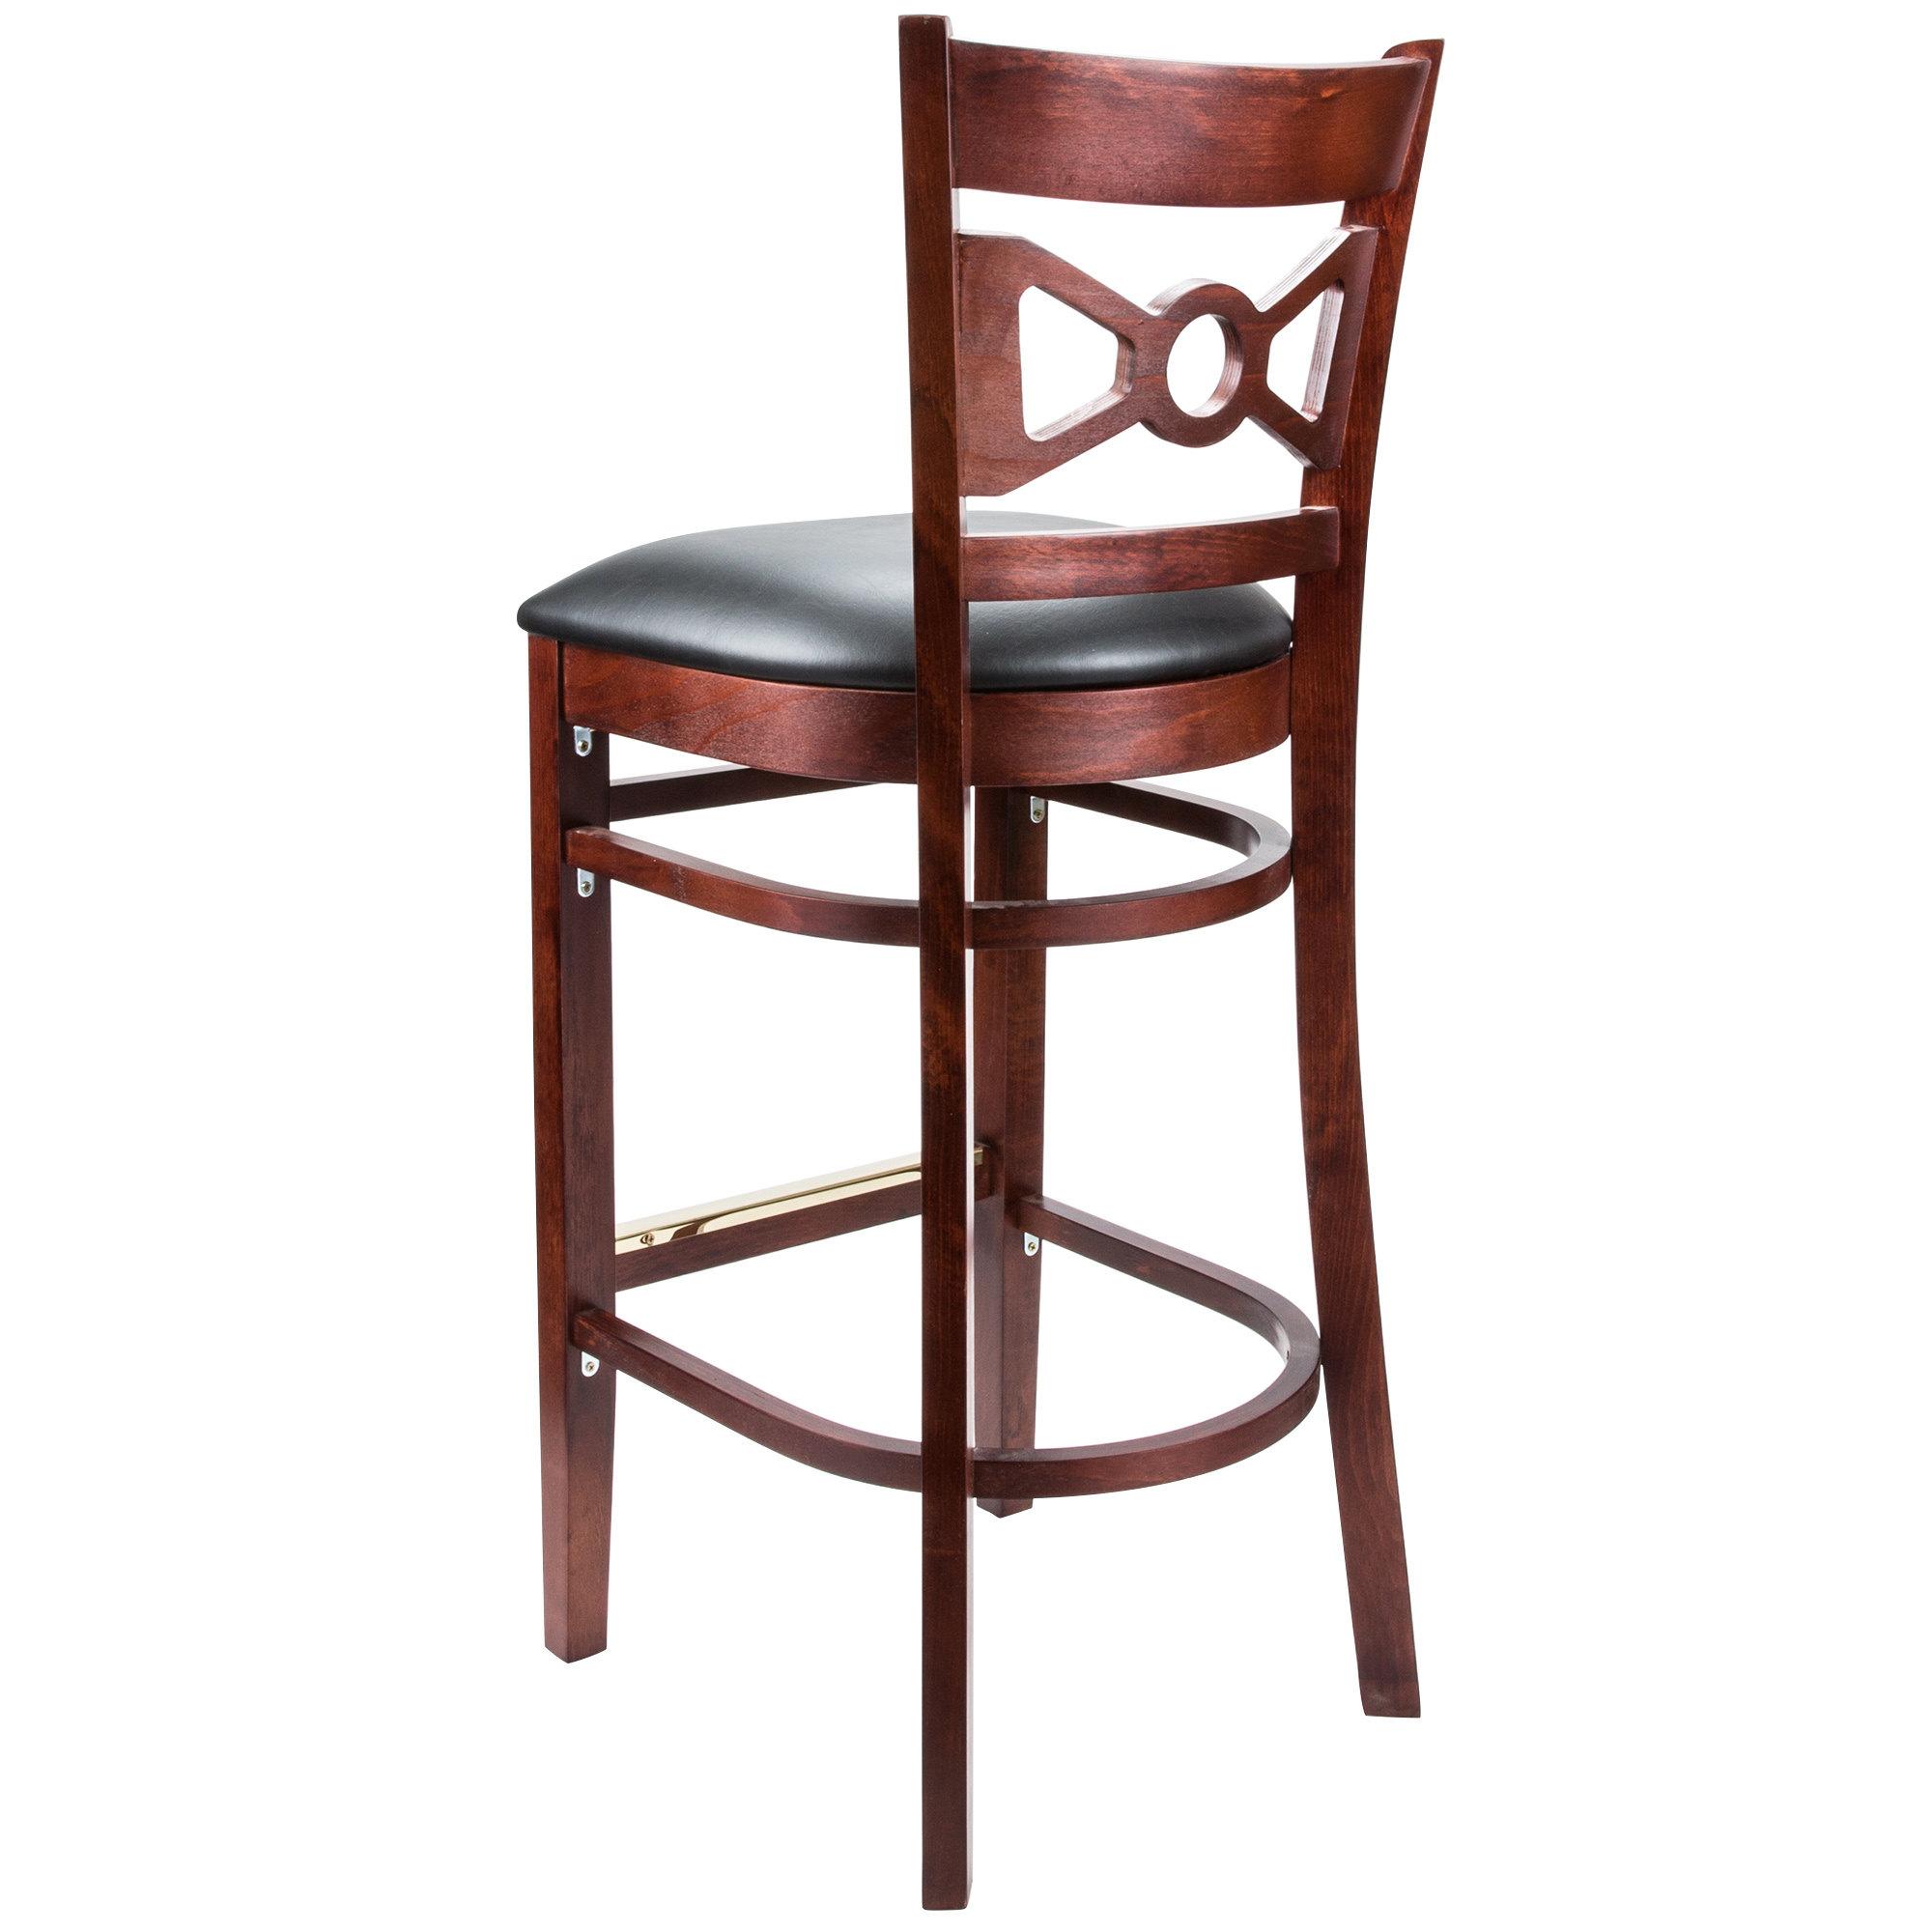 #66 - Mahogany Wood Finished Bow Tie Back Restaurant Barstool with Black Vinyl Seat